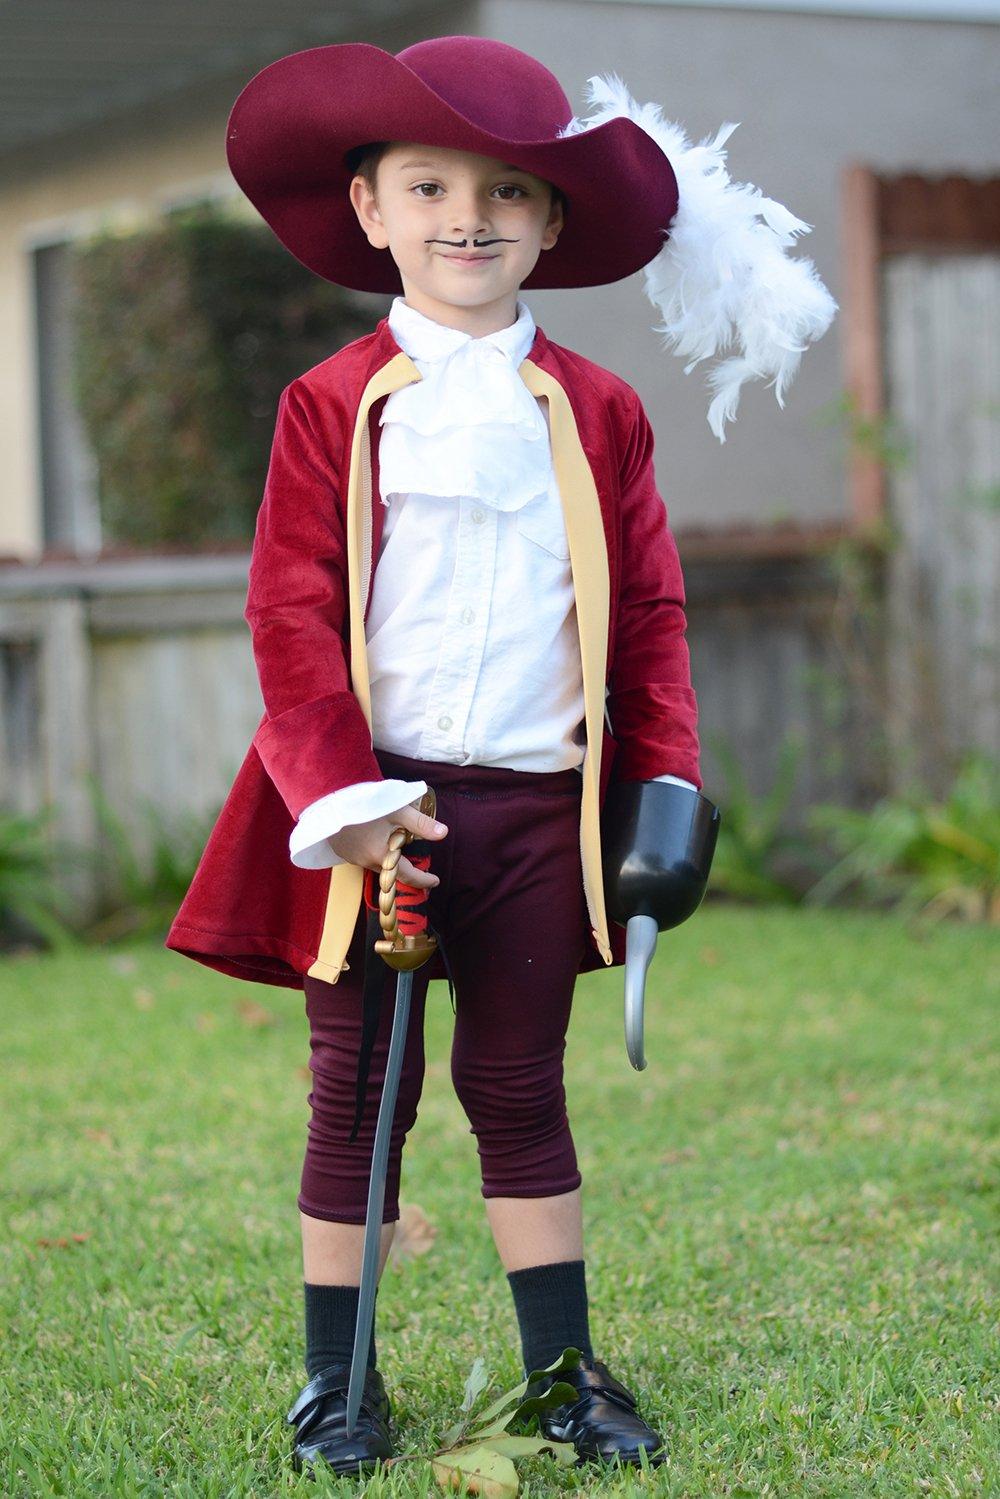 Captain Hook Costume | merricksart.com